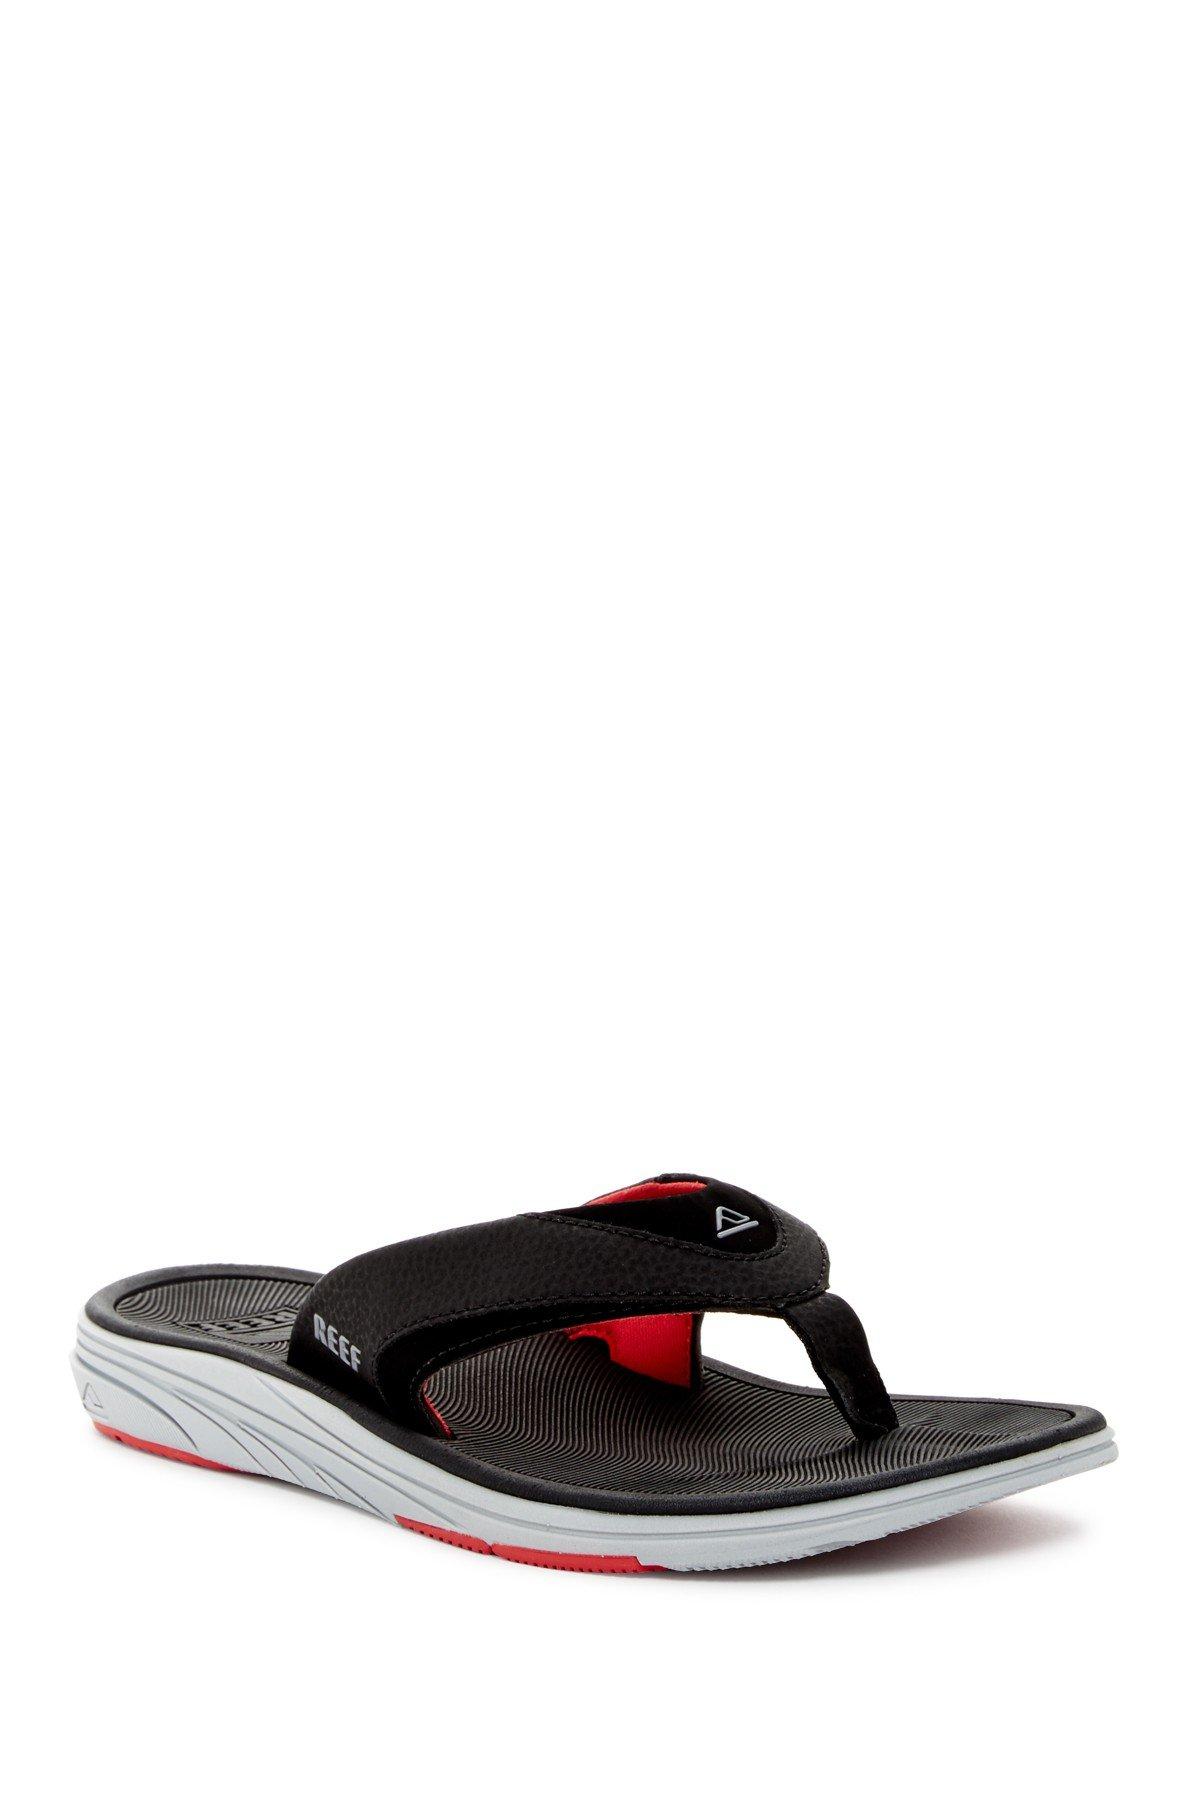 Barbour North Sea Beach Sandal Mens Flip Flops